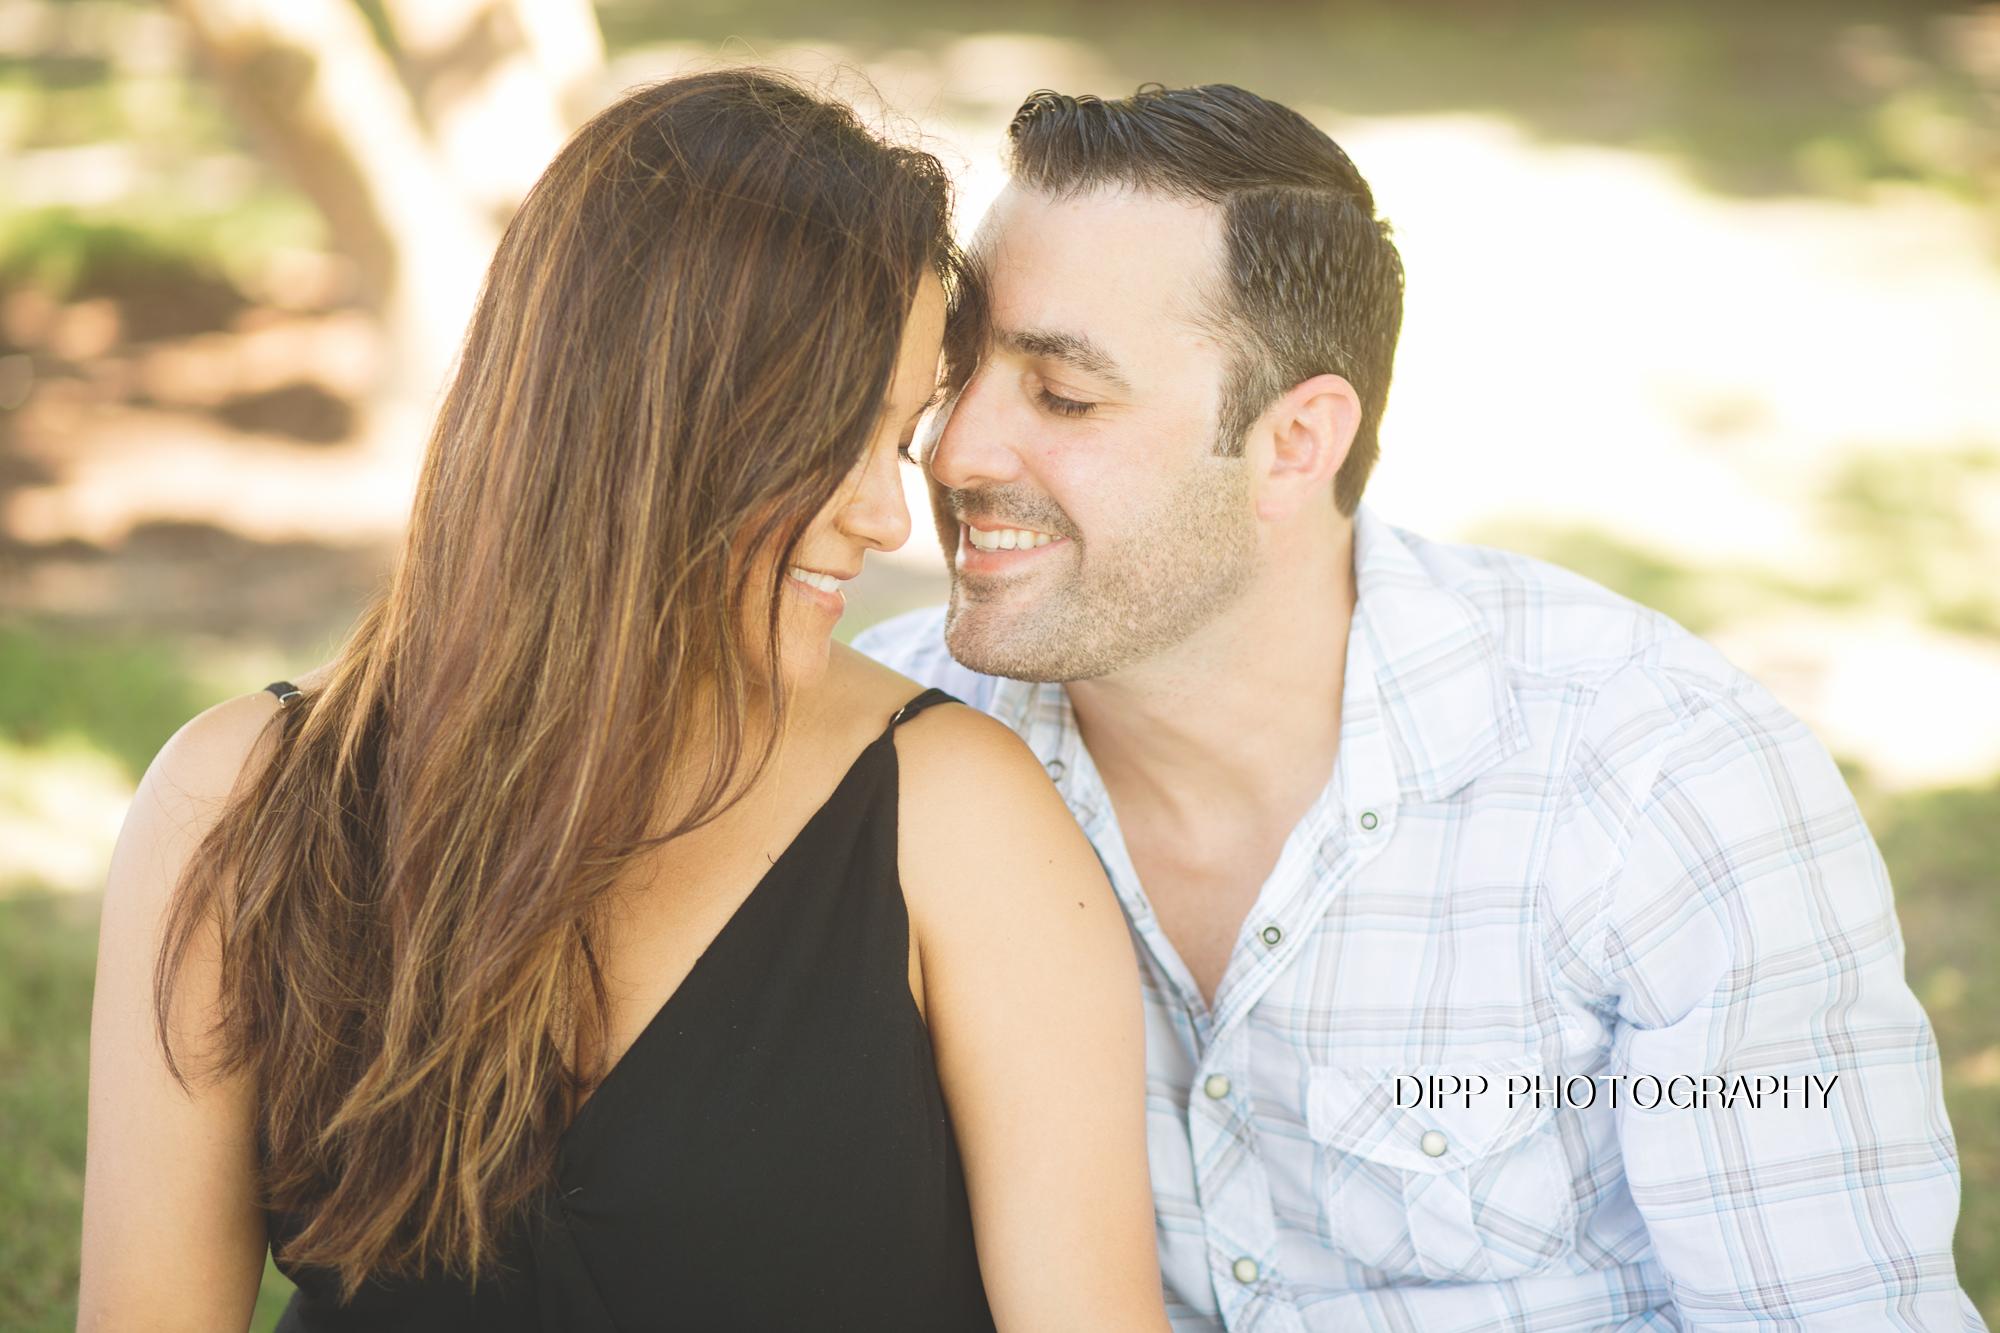 Dipp_2016 Brandon & Sara Mini Engagement Session-250-Edit